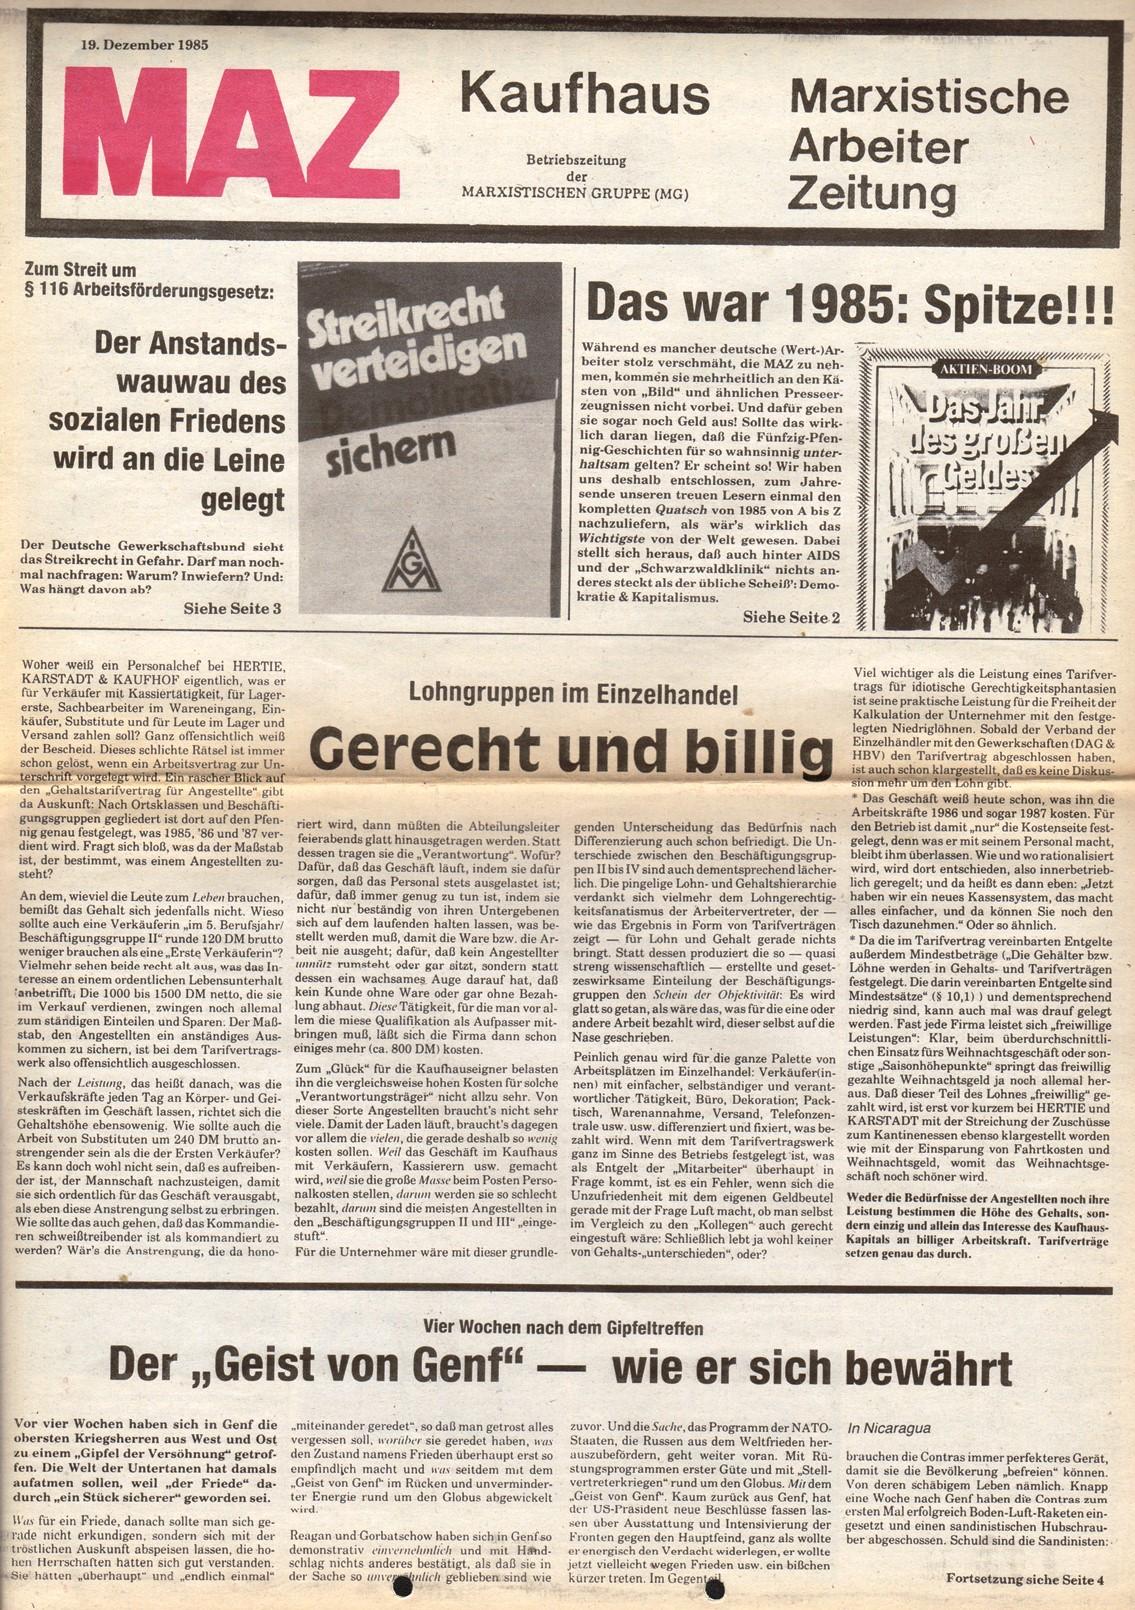 Muenchen_MG_MAZ_Kaufhaus_19851219_01